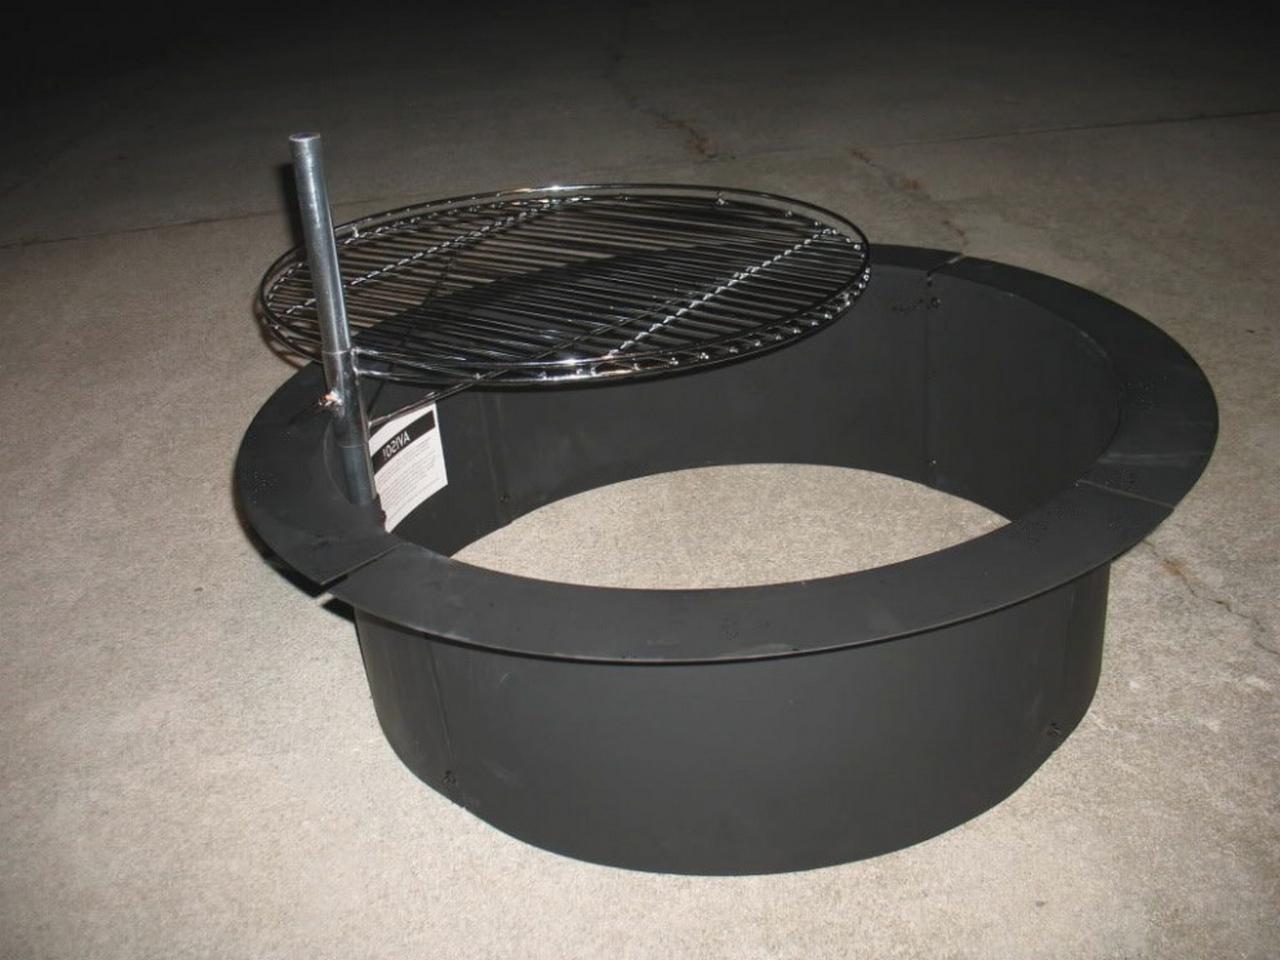 fire pit kits diy-popular-steel-fire-pit-insert-appealing-48-ring-designing-metal-fire-pit-burner-ring-home-depot